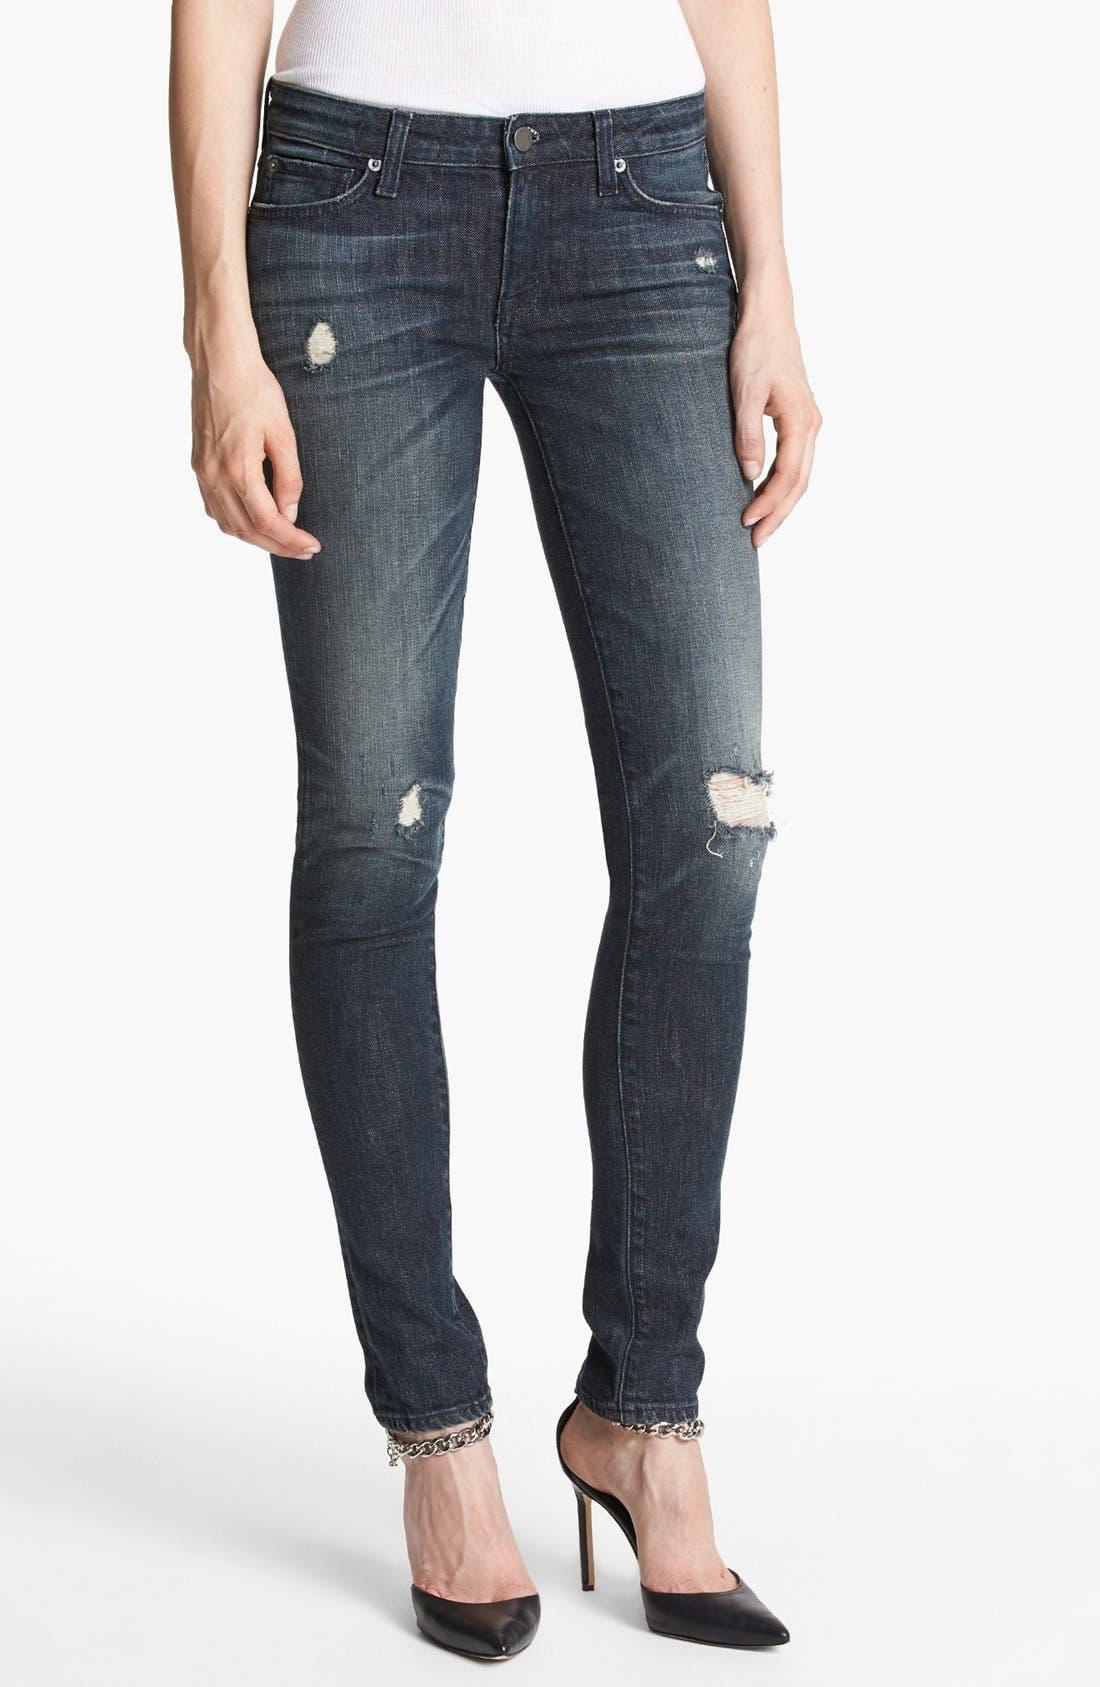 Alternate Image 1 Selected - TEXTILE Elizabeth and James 'Kate' Skinny Jeans